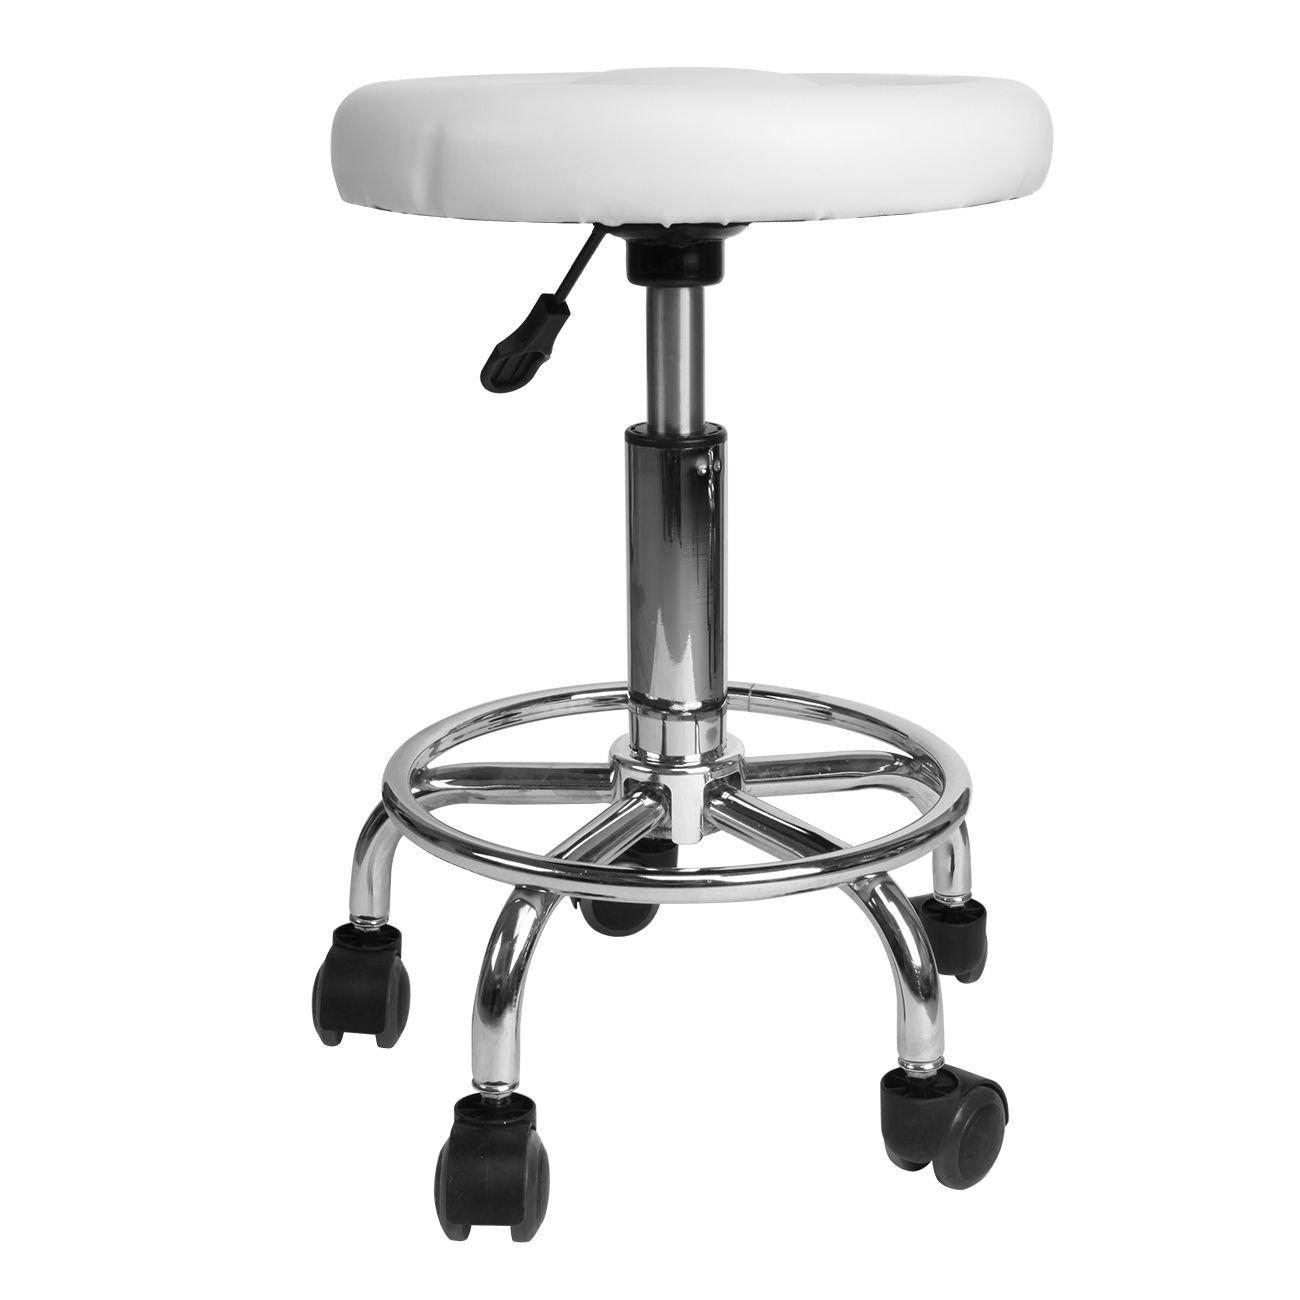 Paneltech 360° Height Adjustable Hydraulic Lift Stool Chair Swivel Seat Spa Tattoo Beauty Salon Faux PU Leather Work Stool (Black)